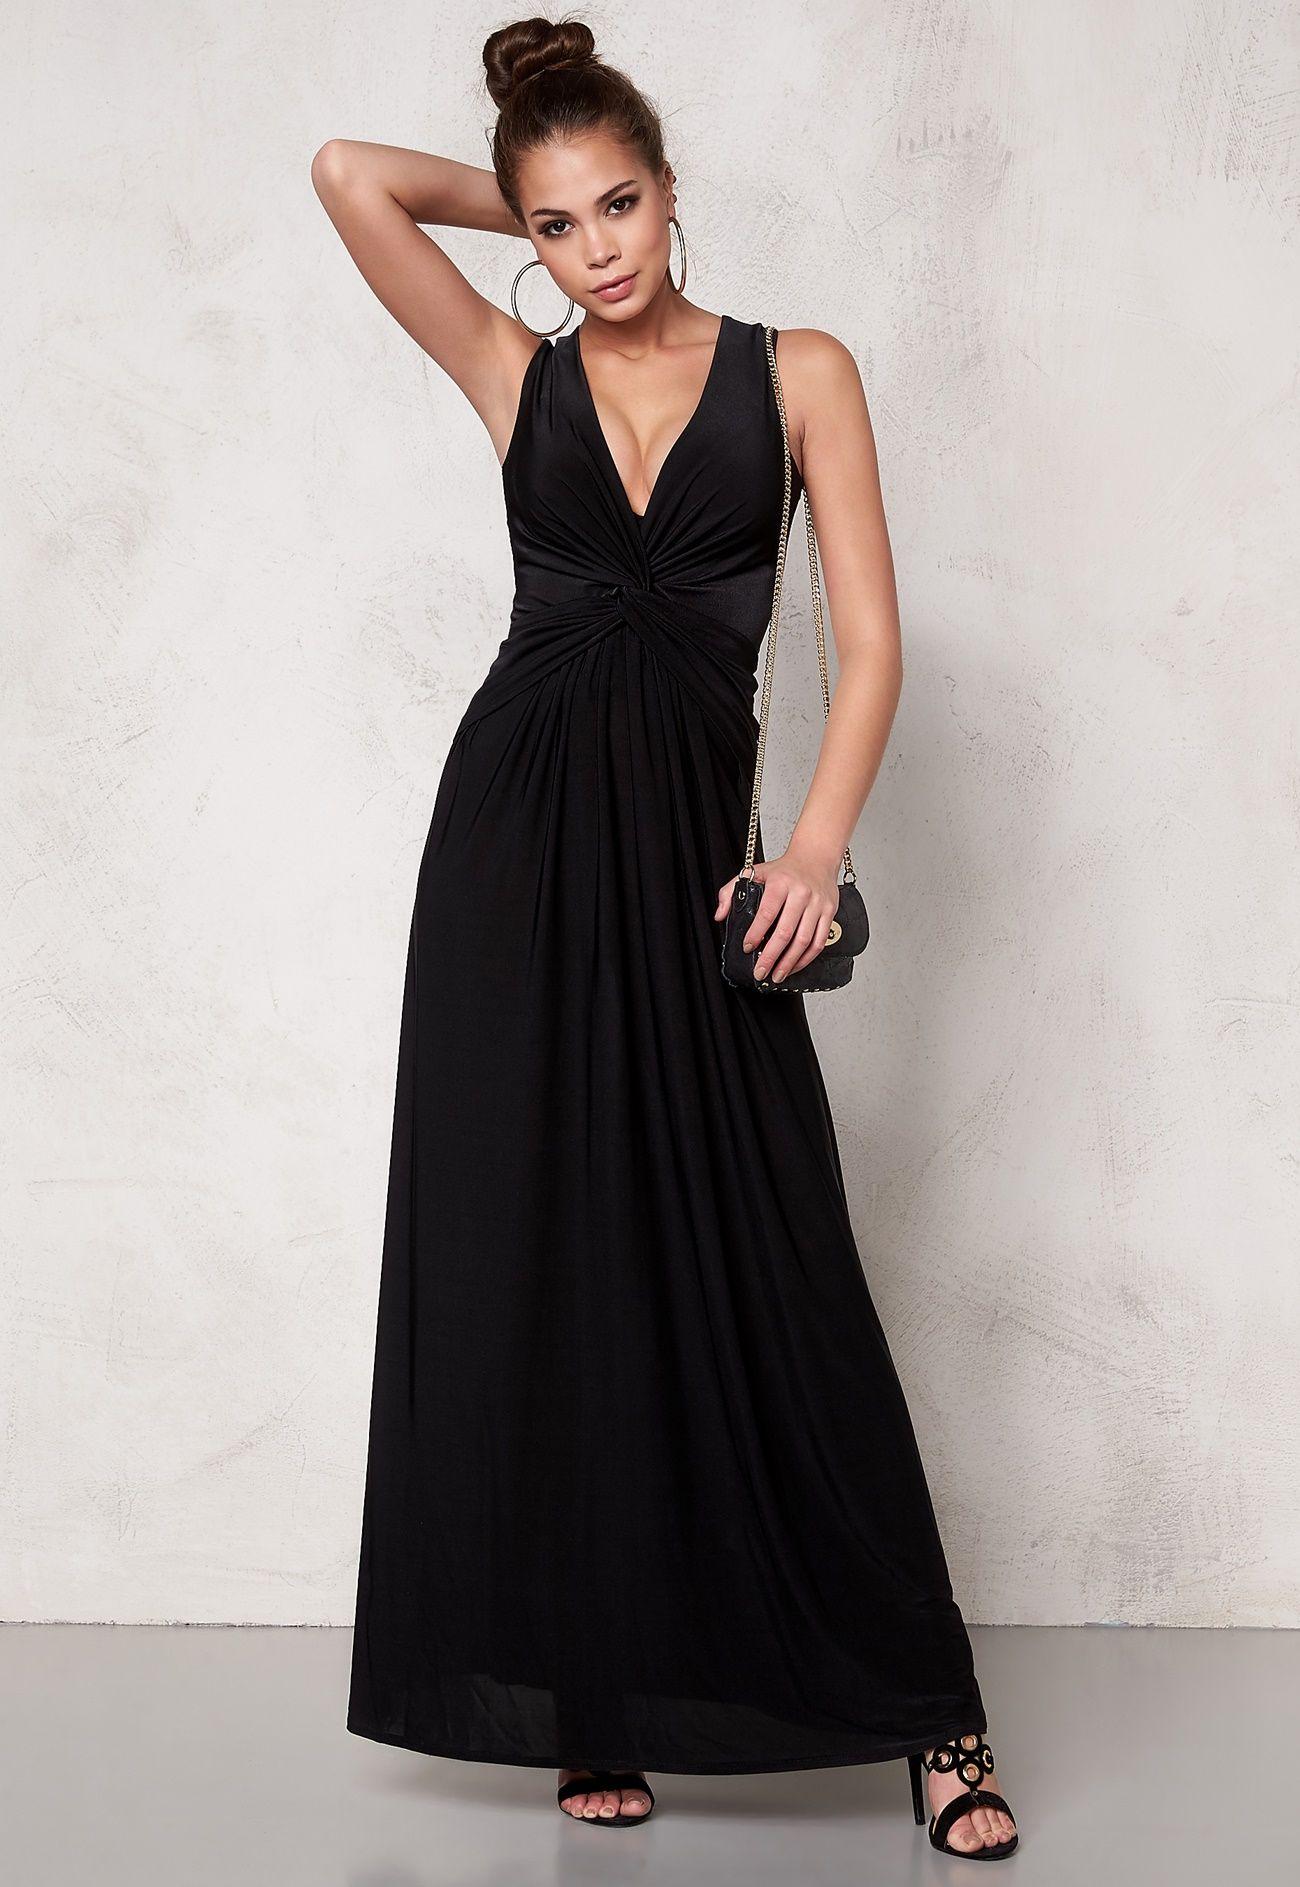 95c47301 Goddiva Dress Black - Bubbleroom | Iltapuvut (pitkät)